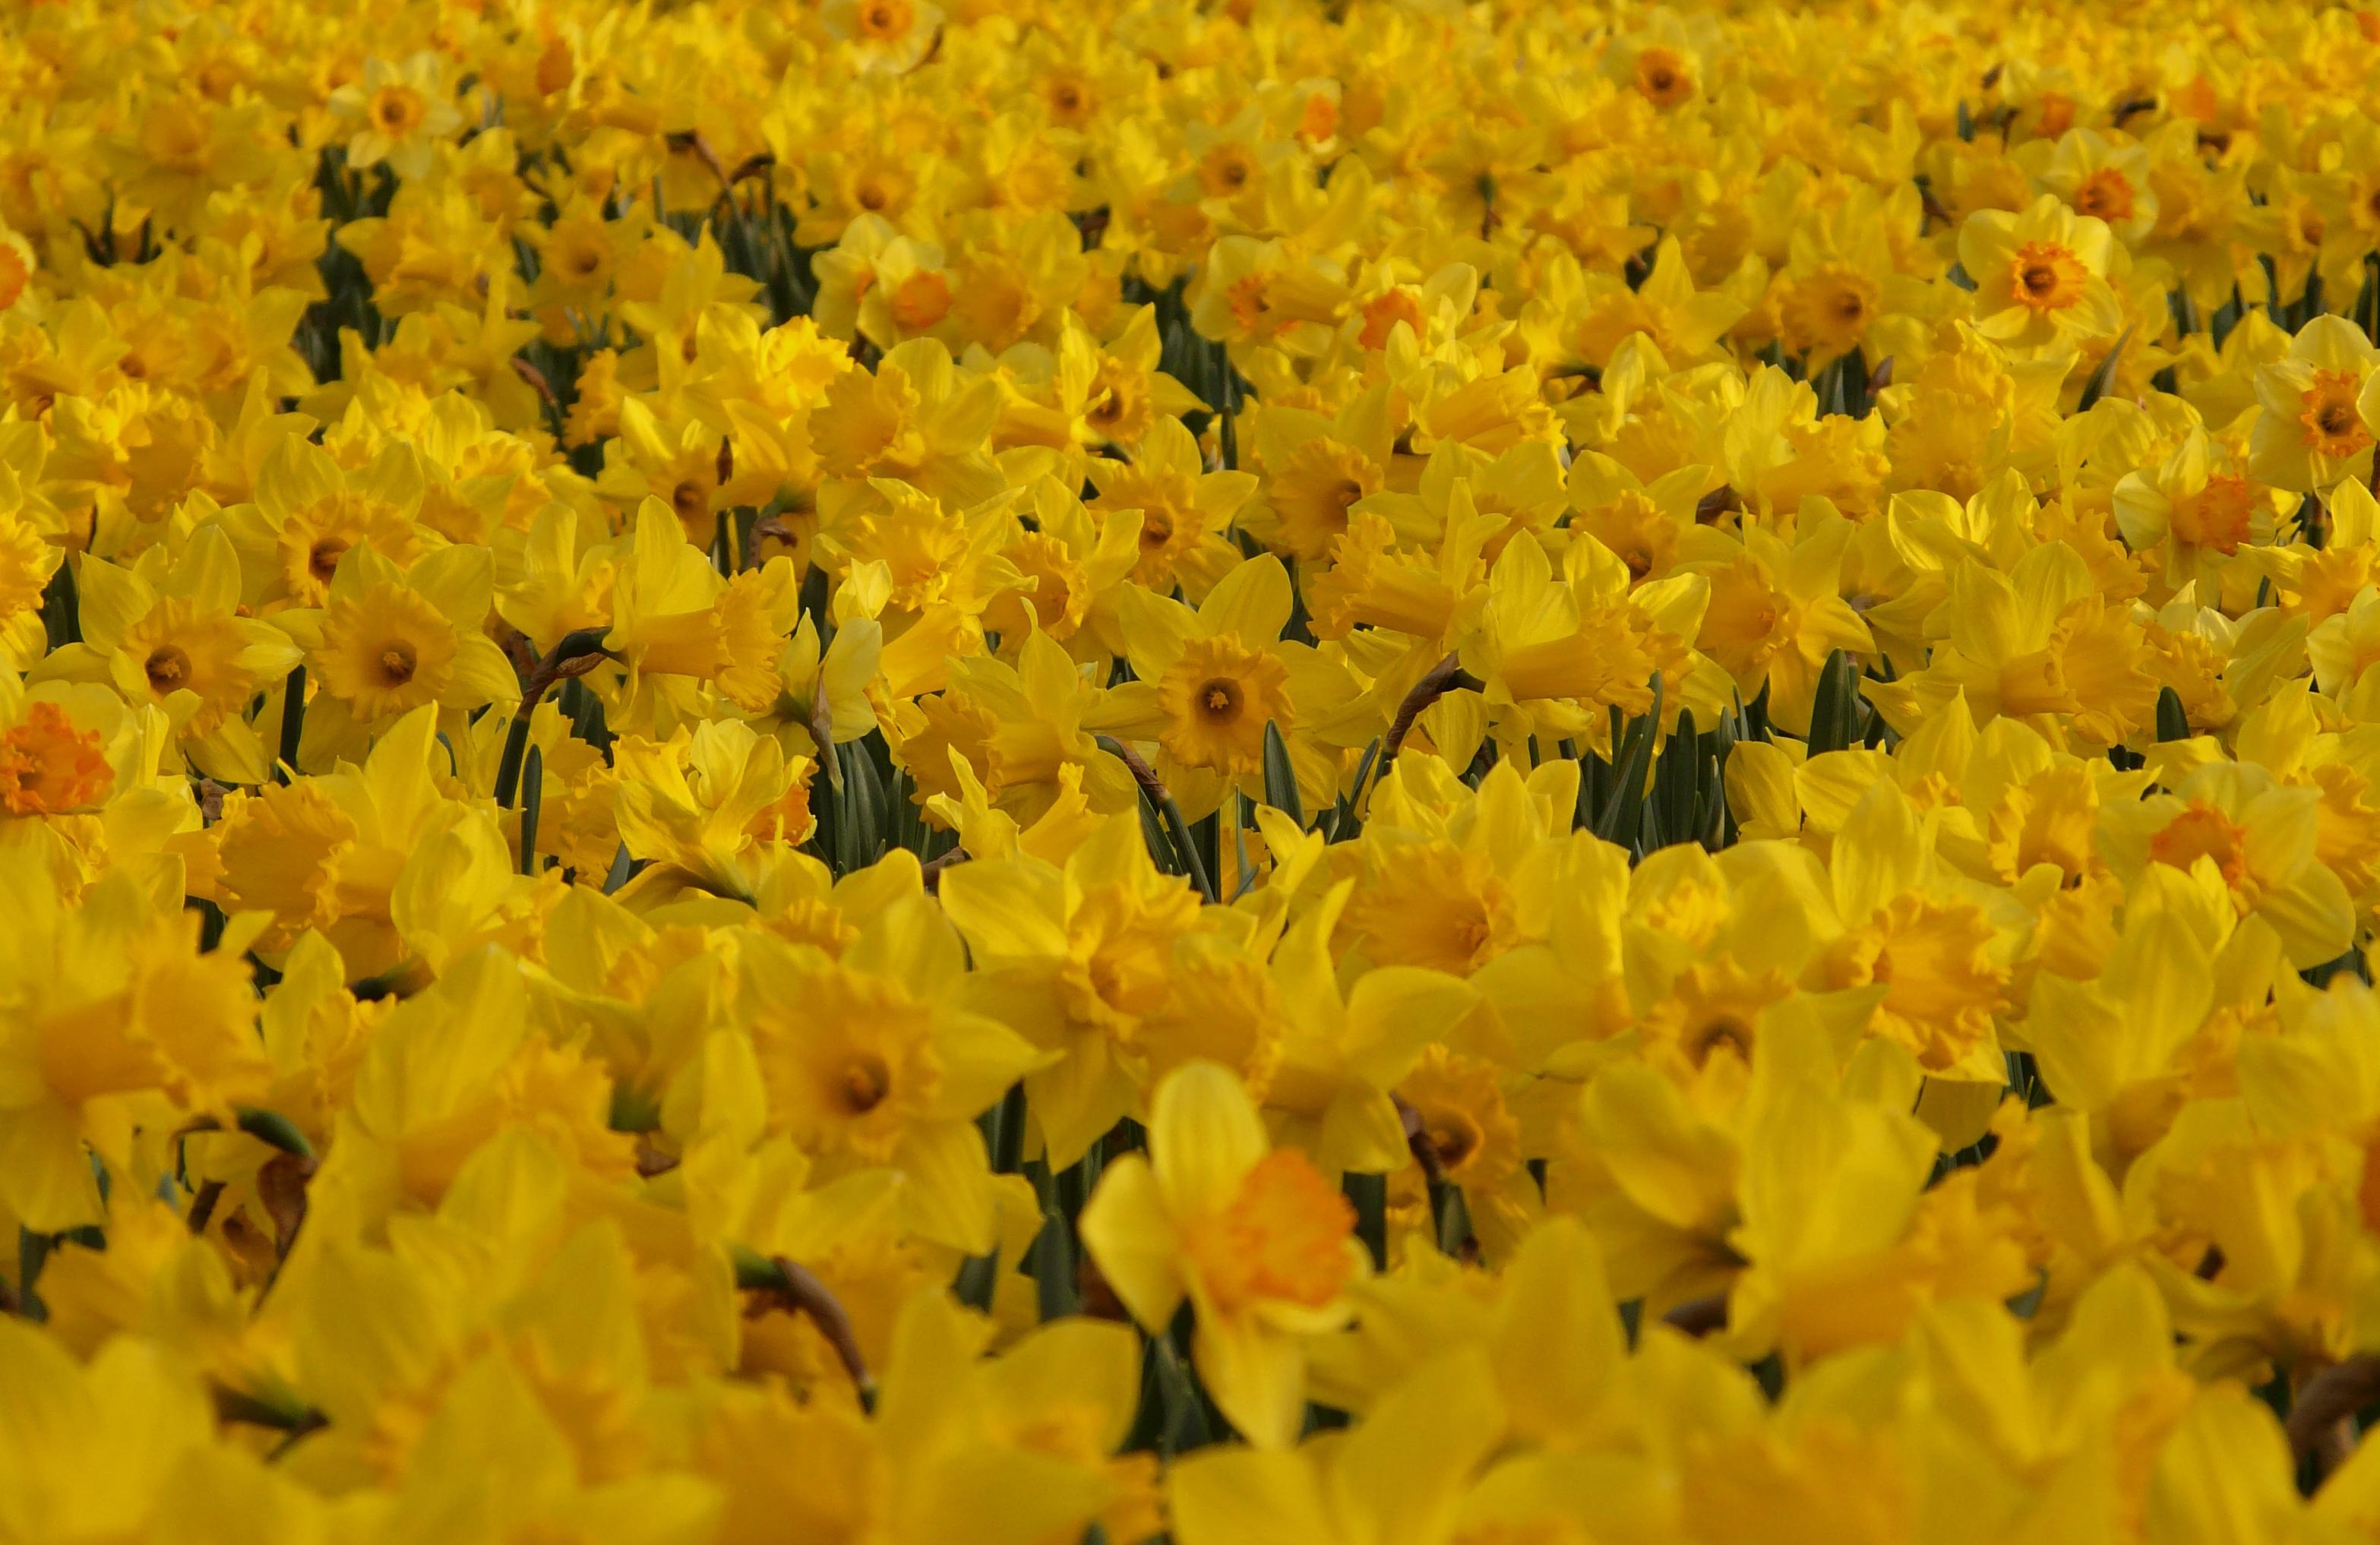 daffodils-photo-95